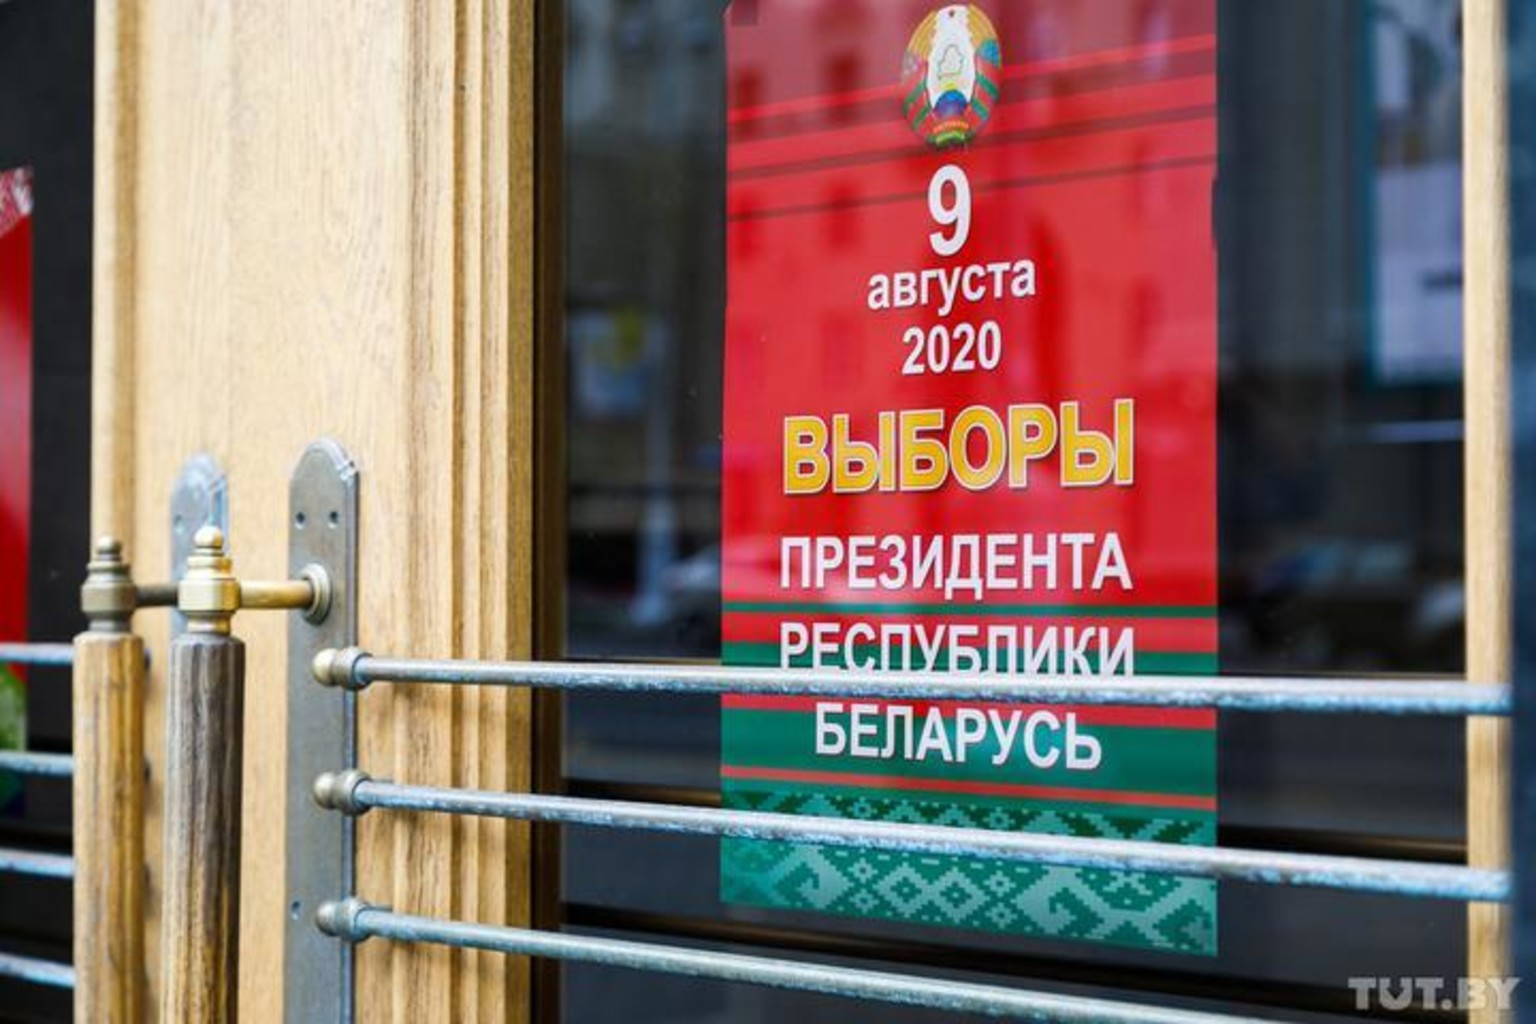 Vybory 20200624 shuk tutby phsl 0032